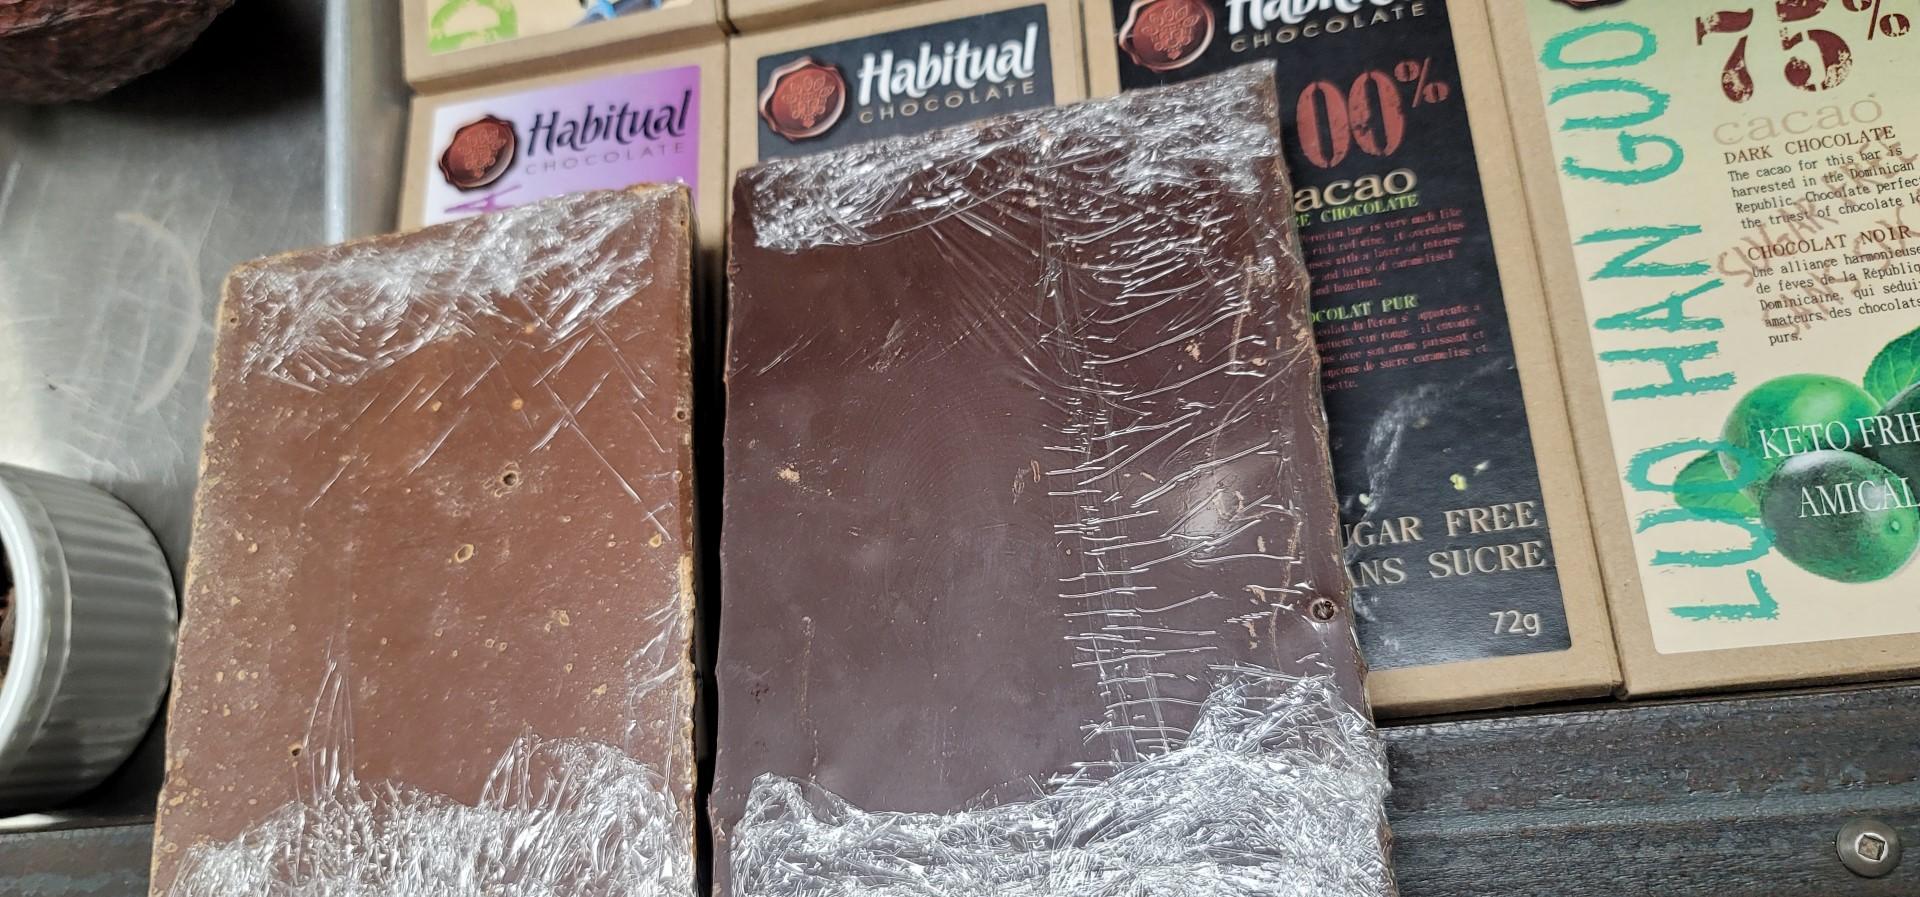 slabs of habitual chocolate